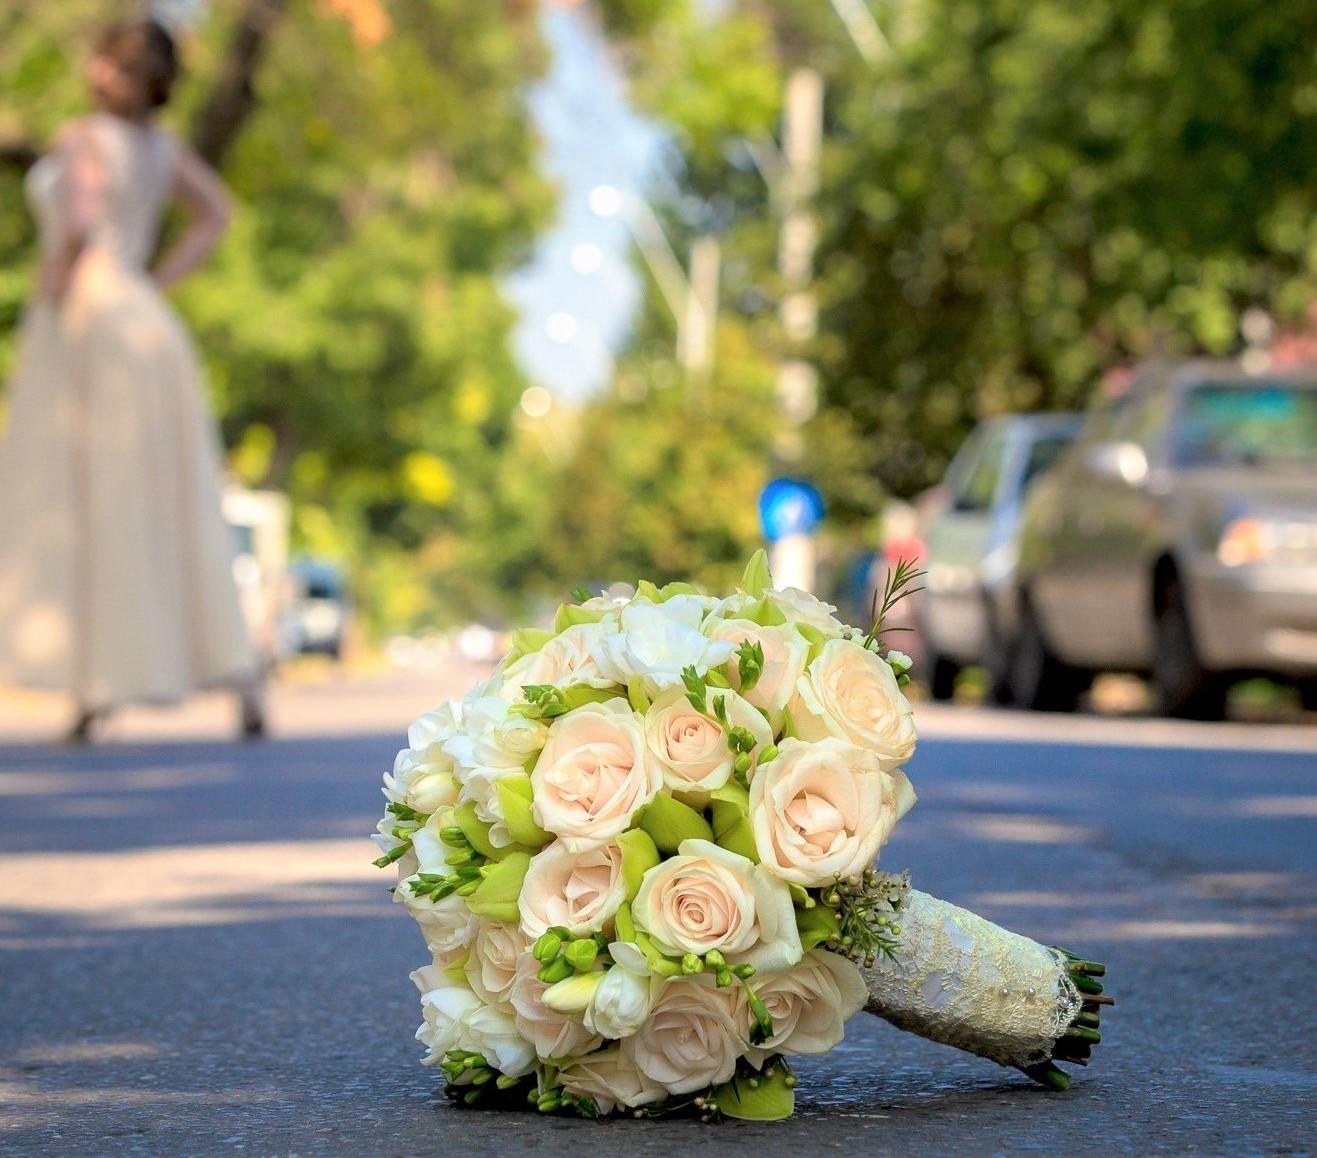 Brautsträuße, Brautstrauß, hochzeitsfloristik